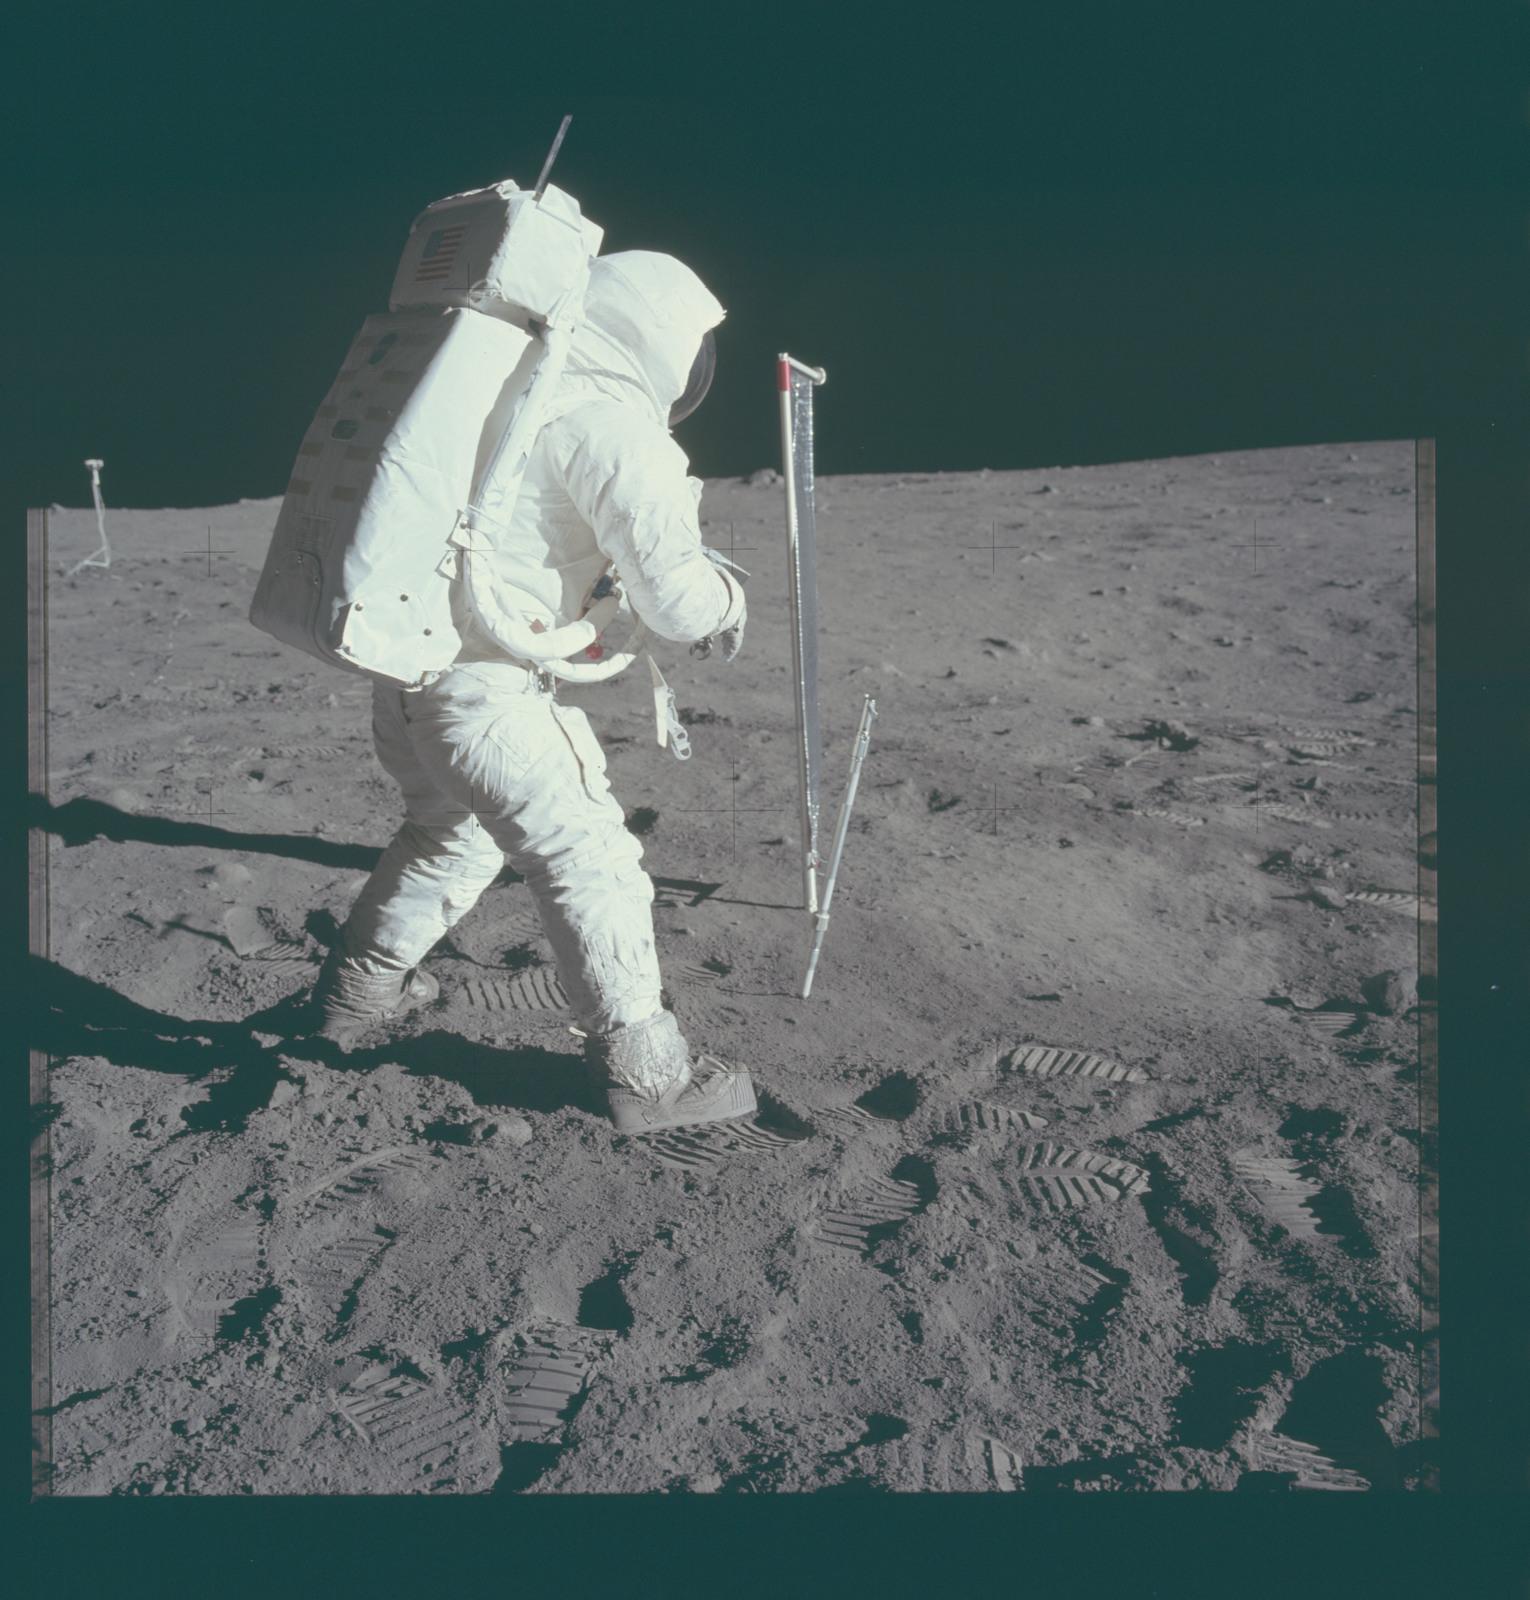 AS11-40-5963 - Apollo 11 - Apollo 11 Mission image - Astronaut Edwin Aldrin takes a core-tube sample